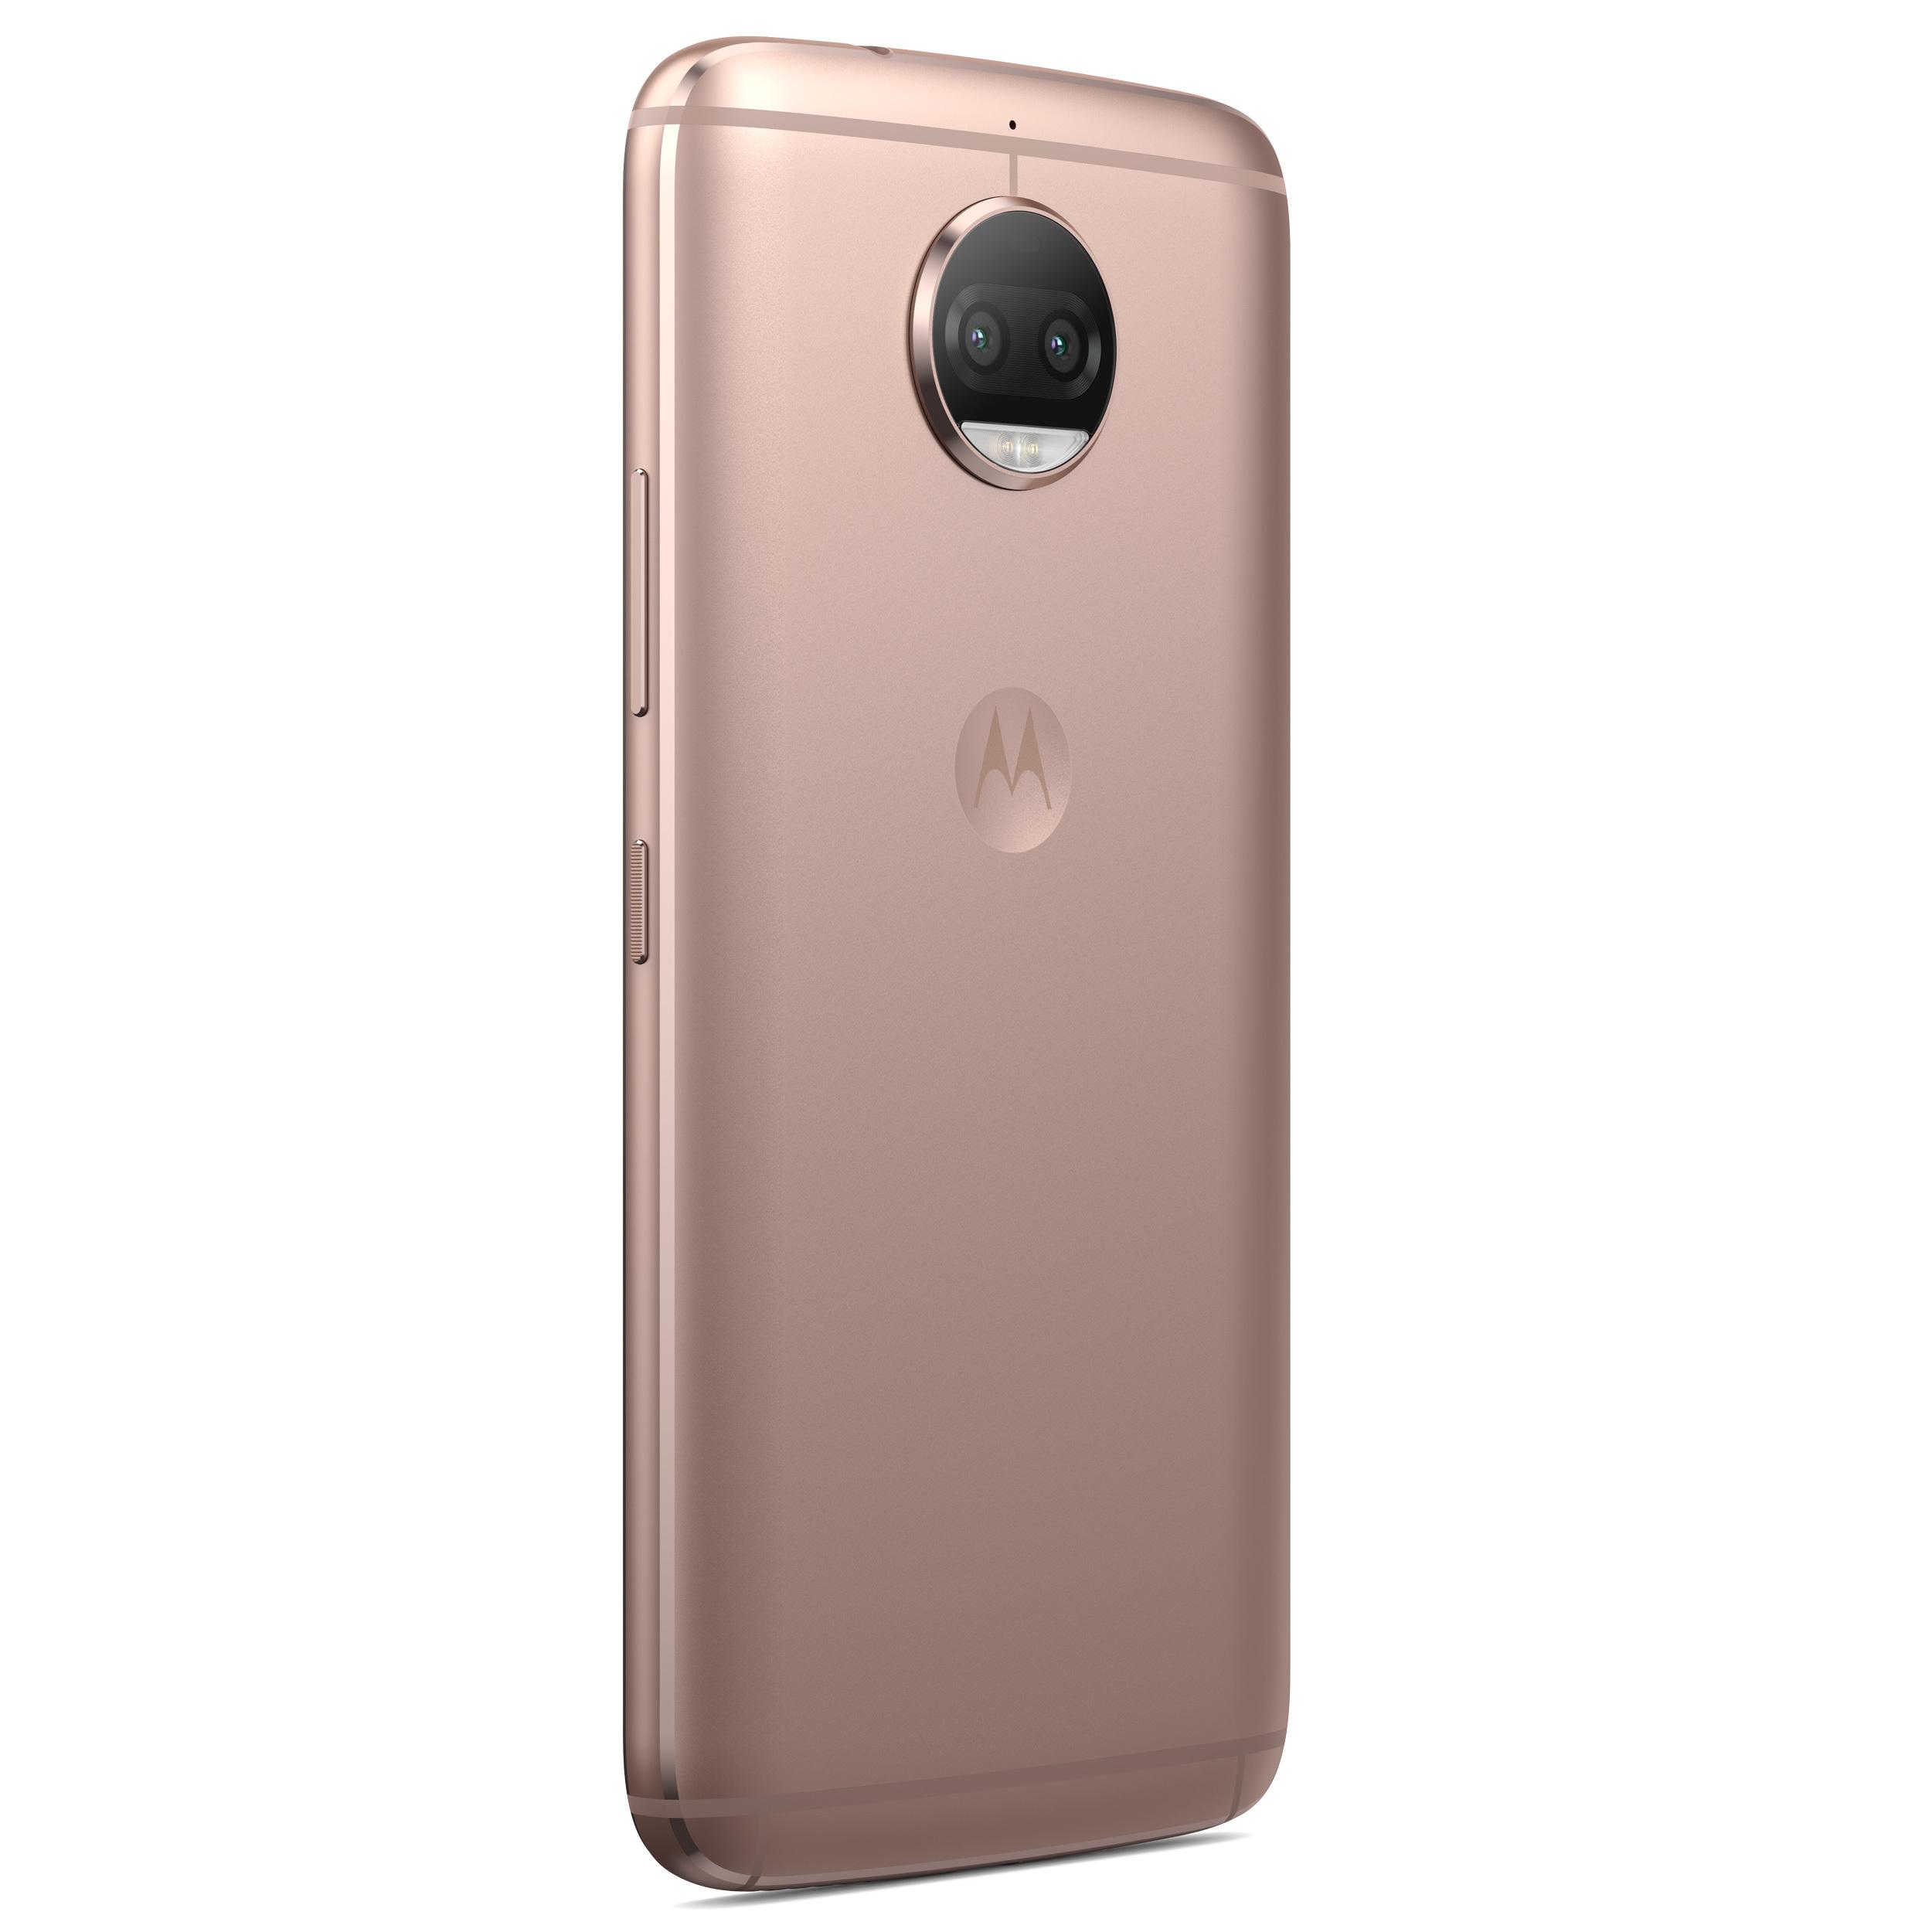 Motorola Moto G5s Plus Smartphone Review - NotebookCheck net Reviews